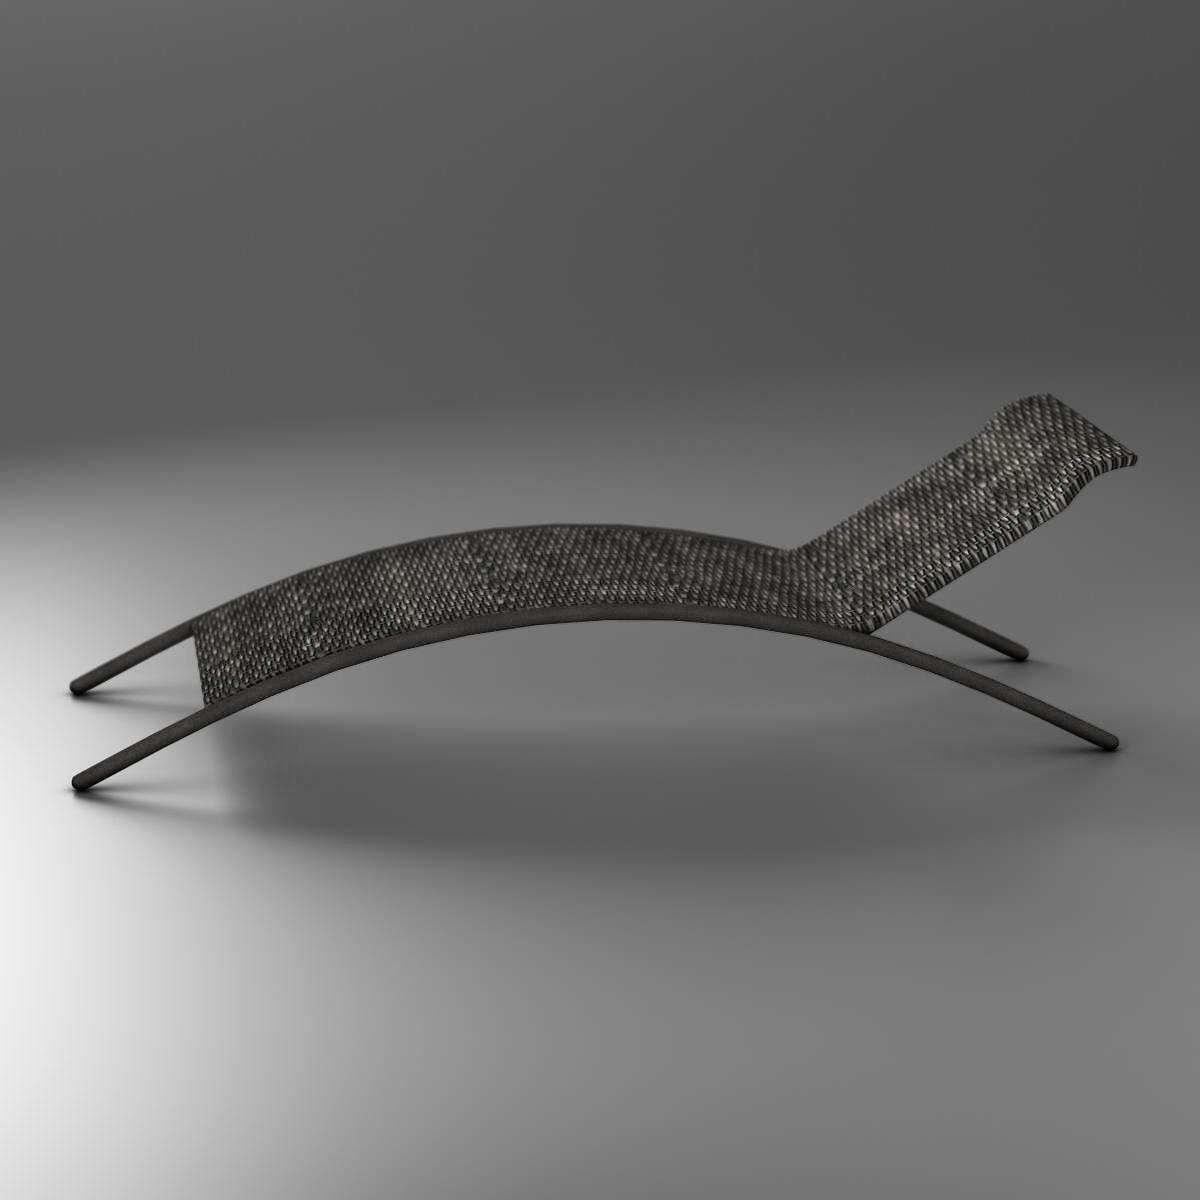 sunbed chair 3d model 3ds max fbx c4d ma mb obj 162642